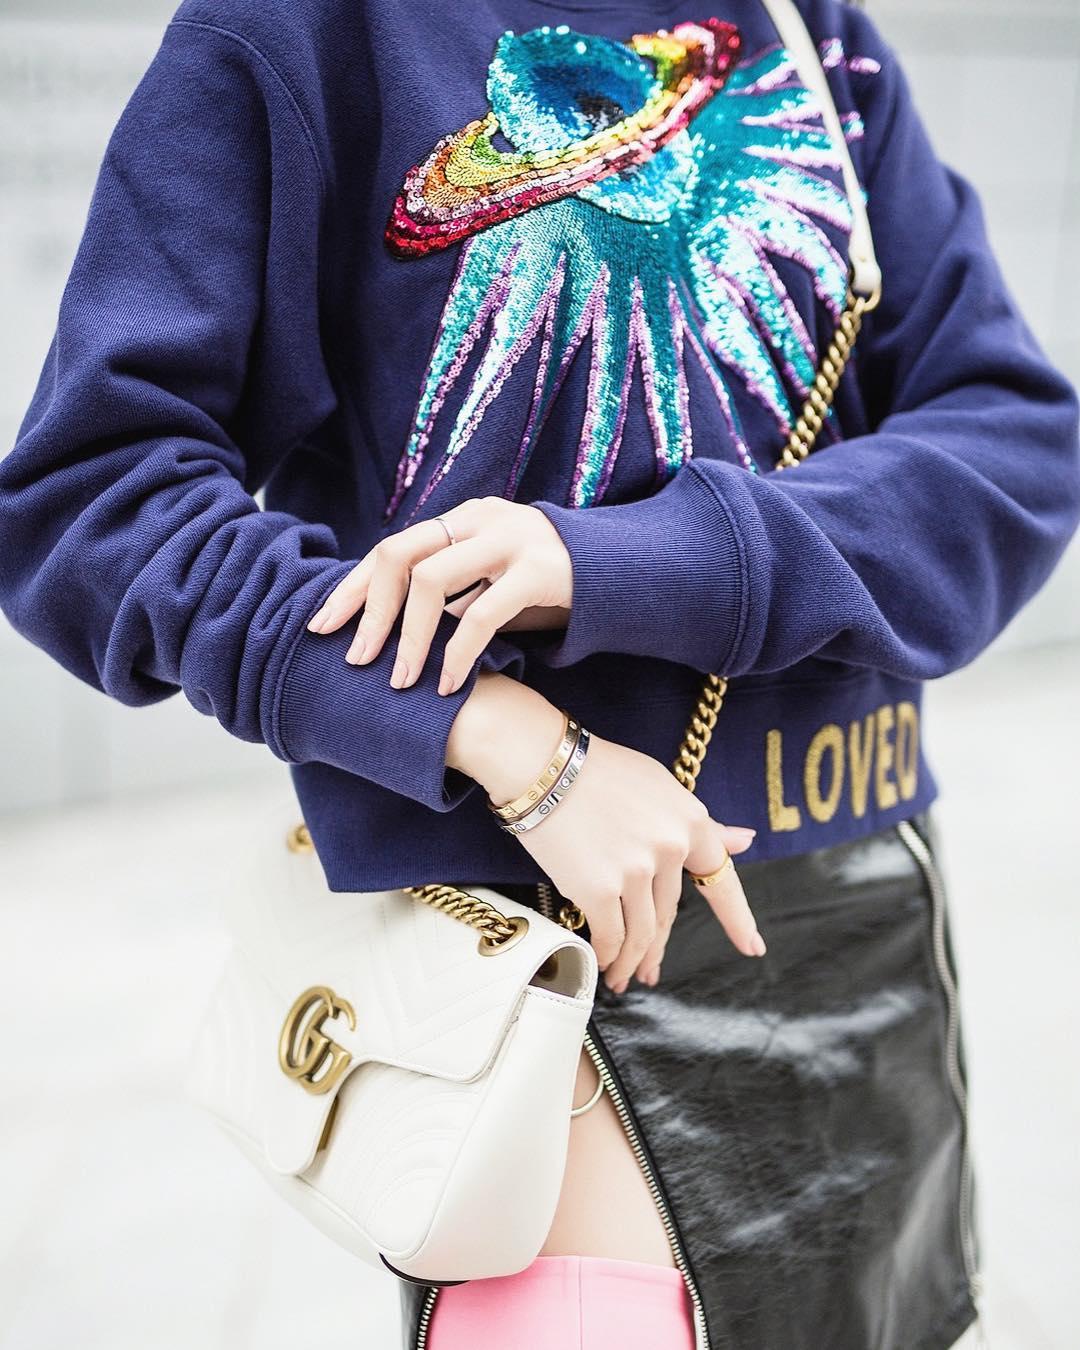 jolie-nguyen-hoa-tiet-ngam-nghia-street-style-cua-sao-viet-tai-seoul-fashion-week